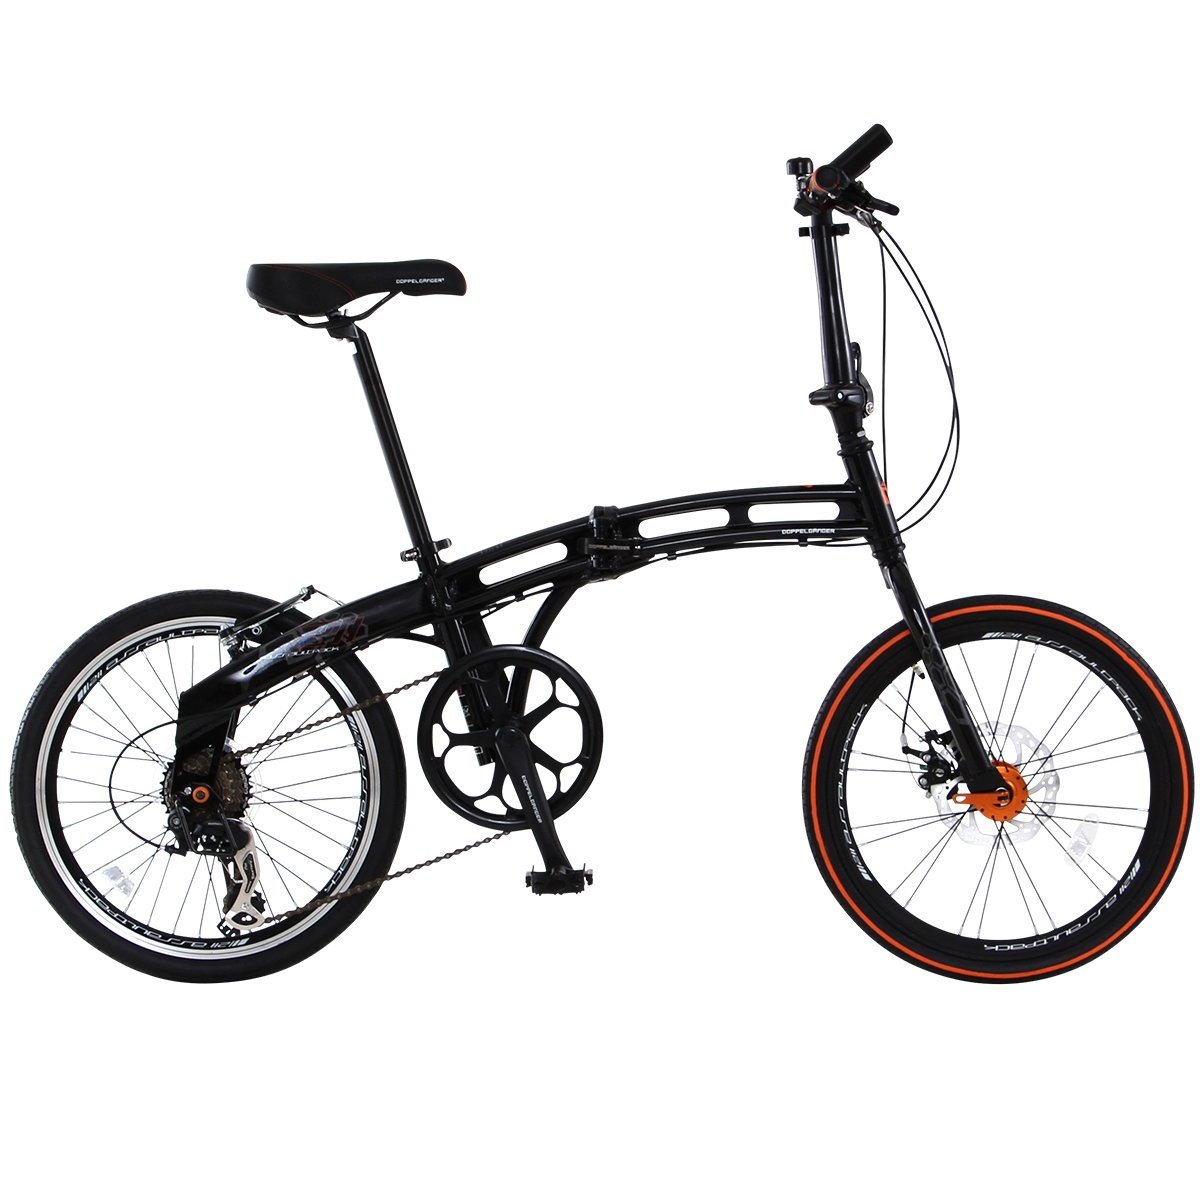 DOPPELGANGER(ドッペルギャンガー) 折りたたみ自転車 BLACKMAXシリーズ ASSAULTPACK 211 20インチ パラレルツインチューブフレーム採用モデル B002QQ957A